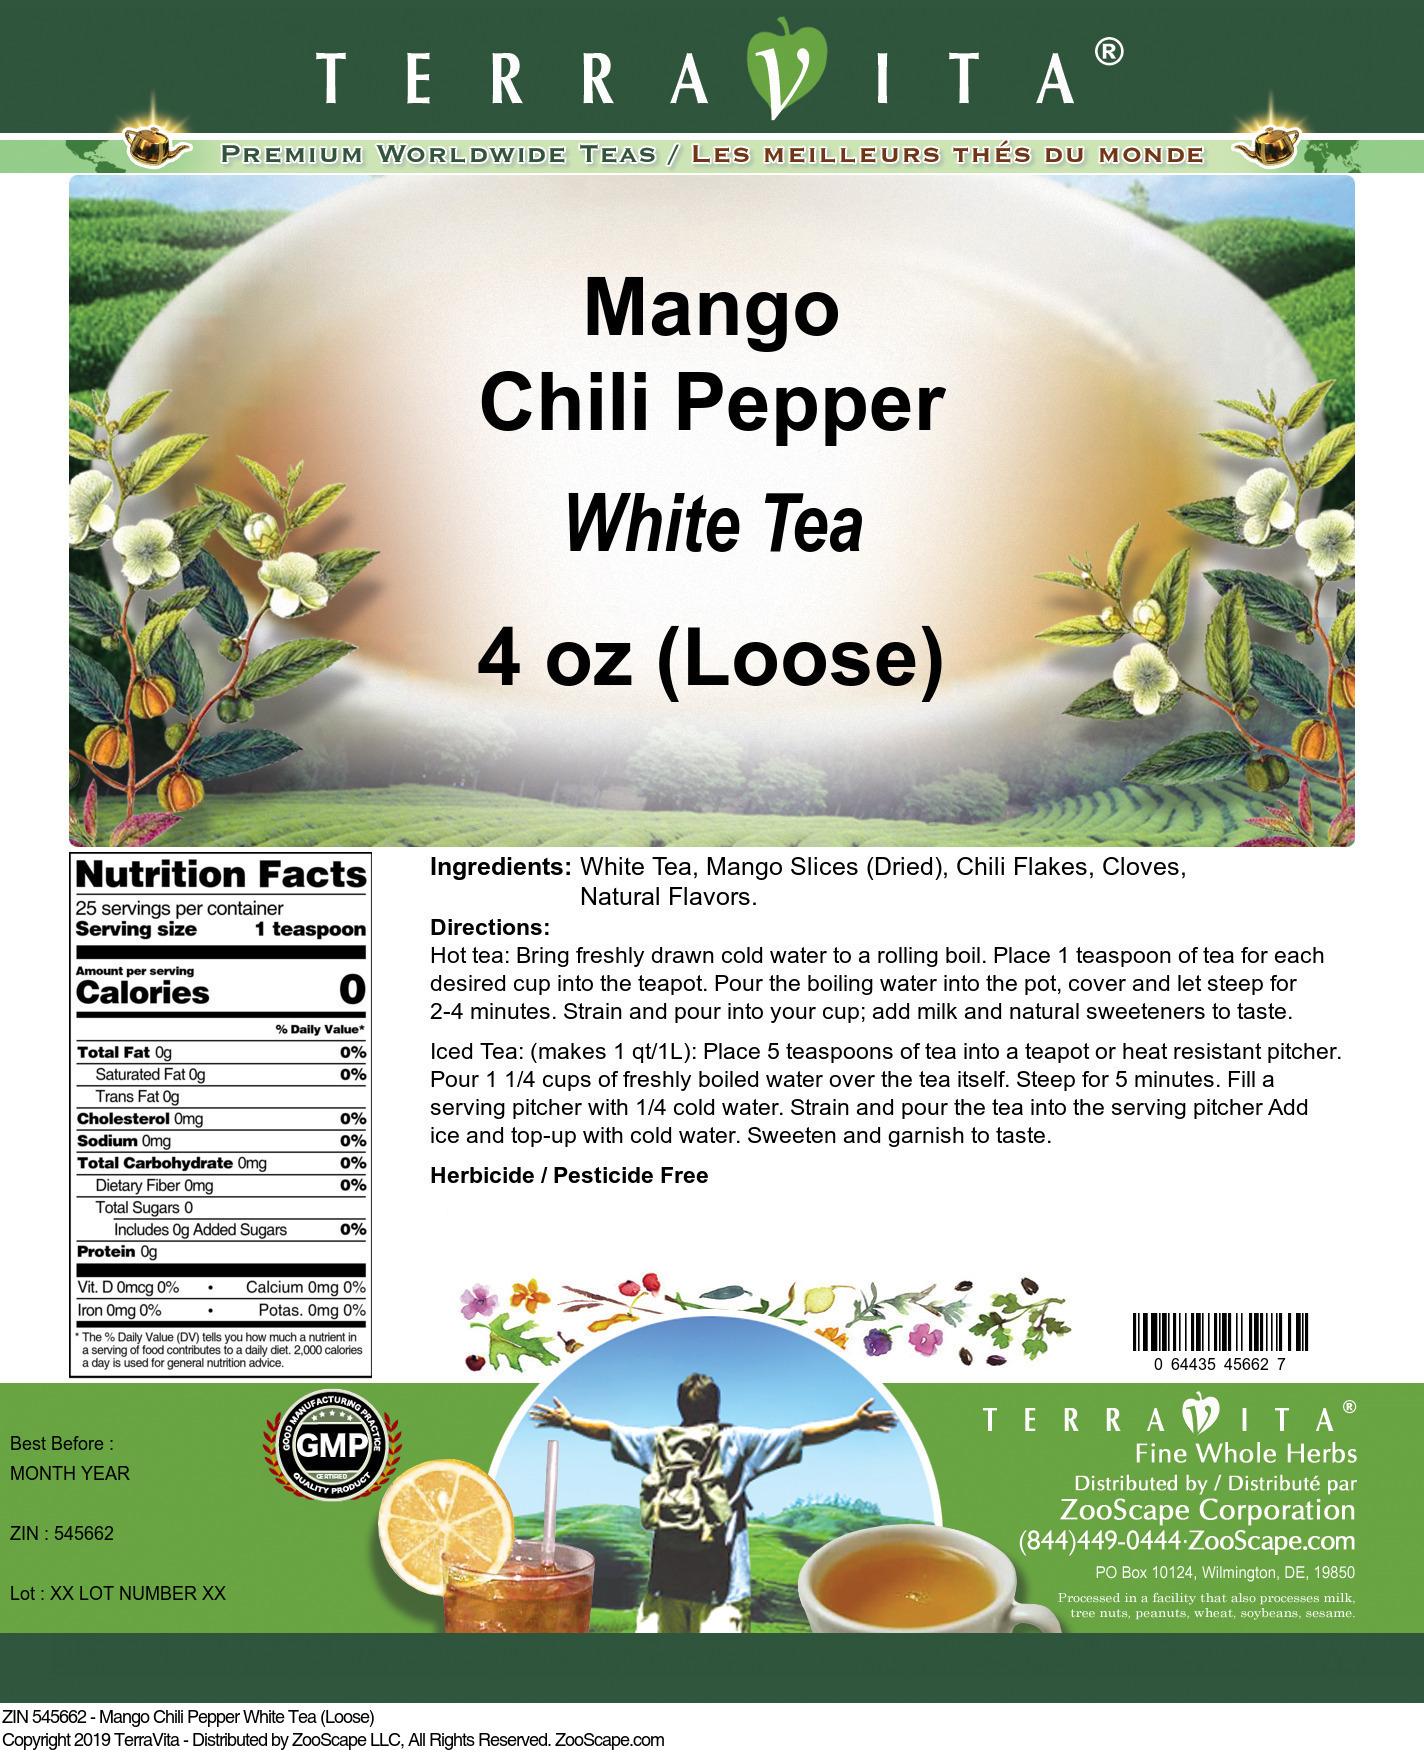 Mango Chili Pepper White Tea (Loose)